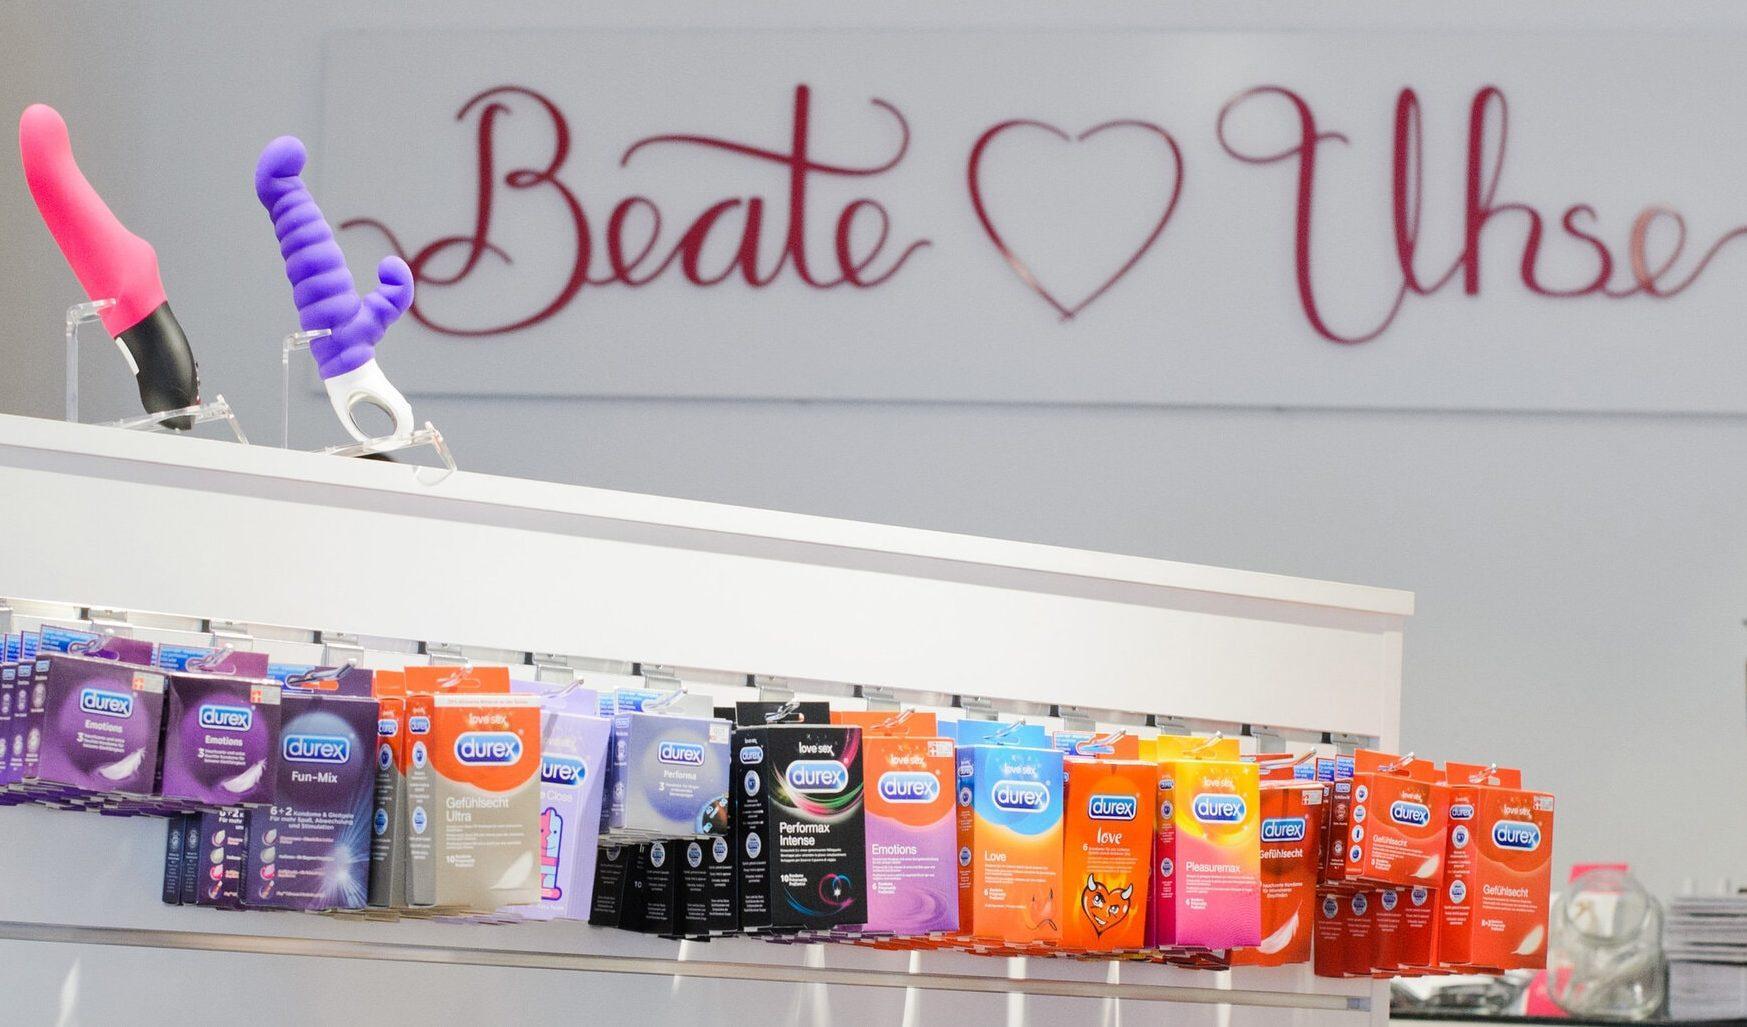 Beate Uhse Sex-Shop